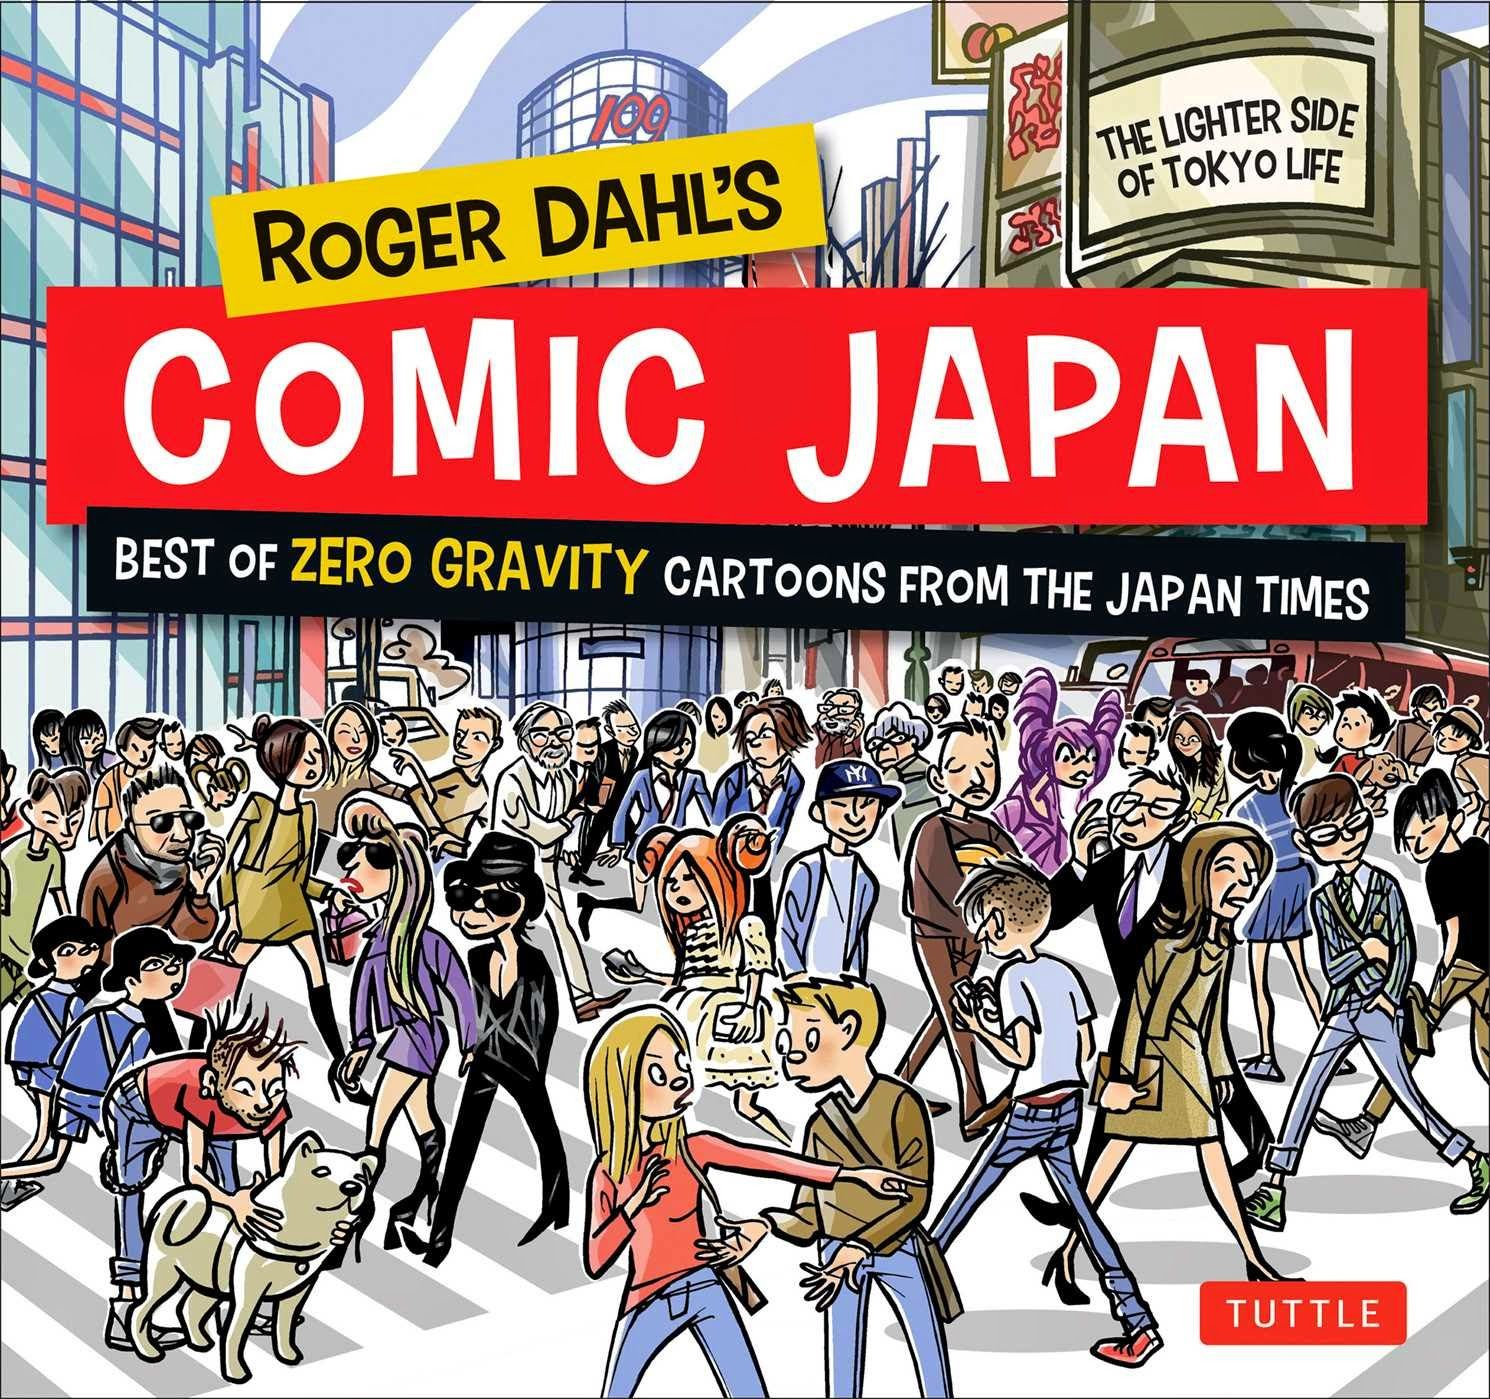 Japan - It's A Wonderful Rife: Roger Dahl's Comic Japan - Book Review